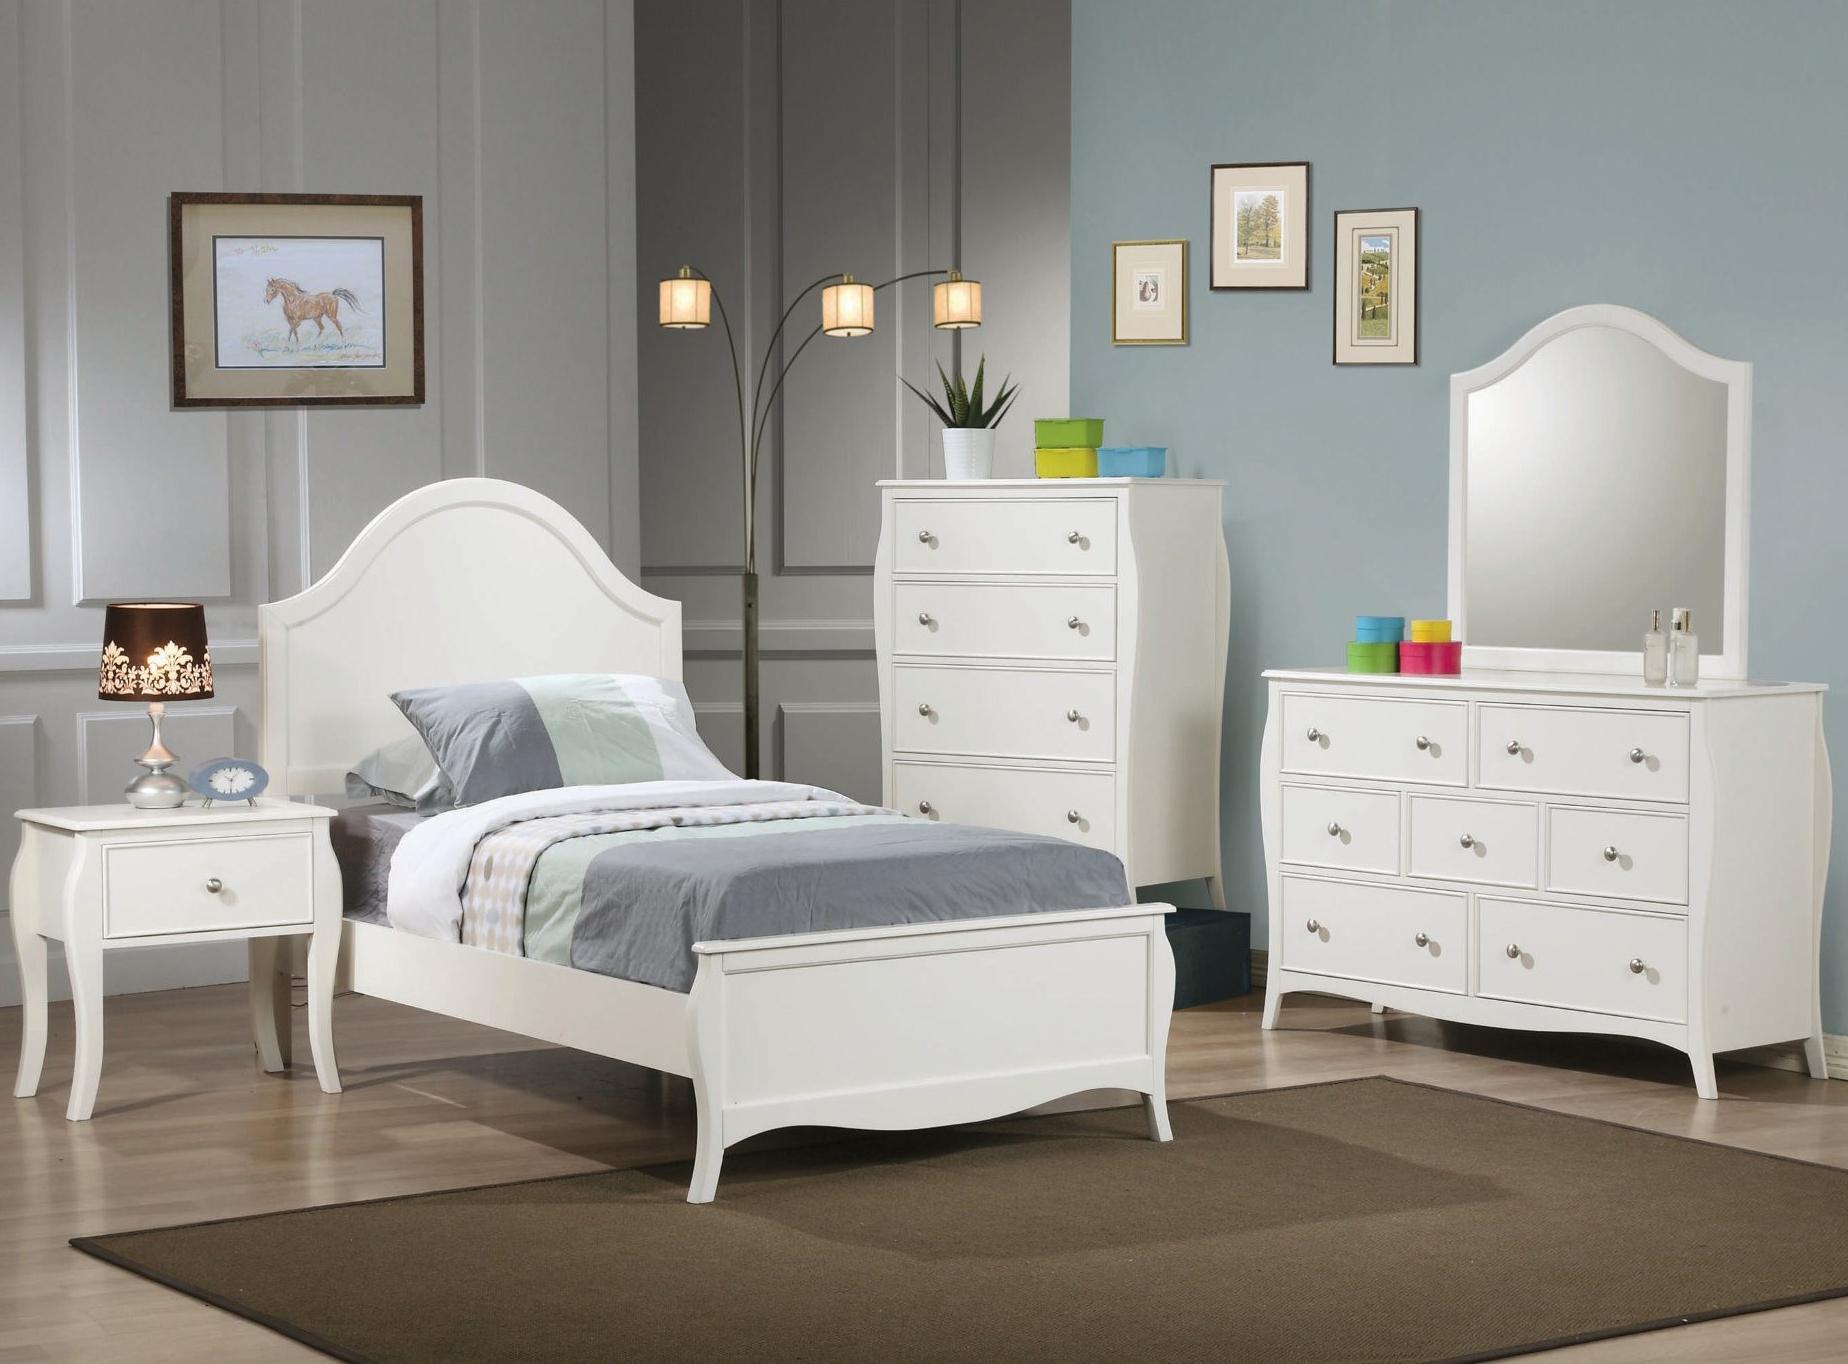 Coaster Furniture - Dominique Bedroom Set